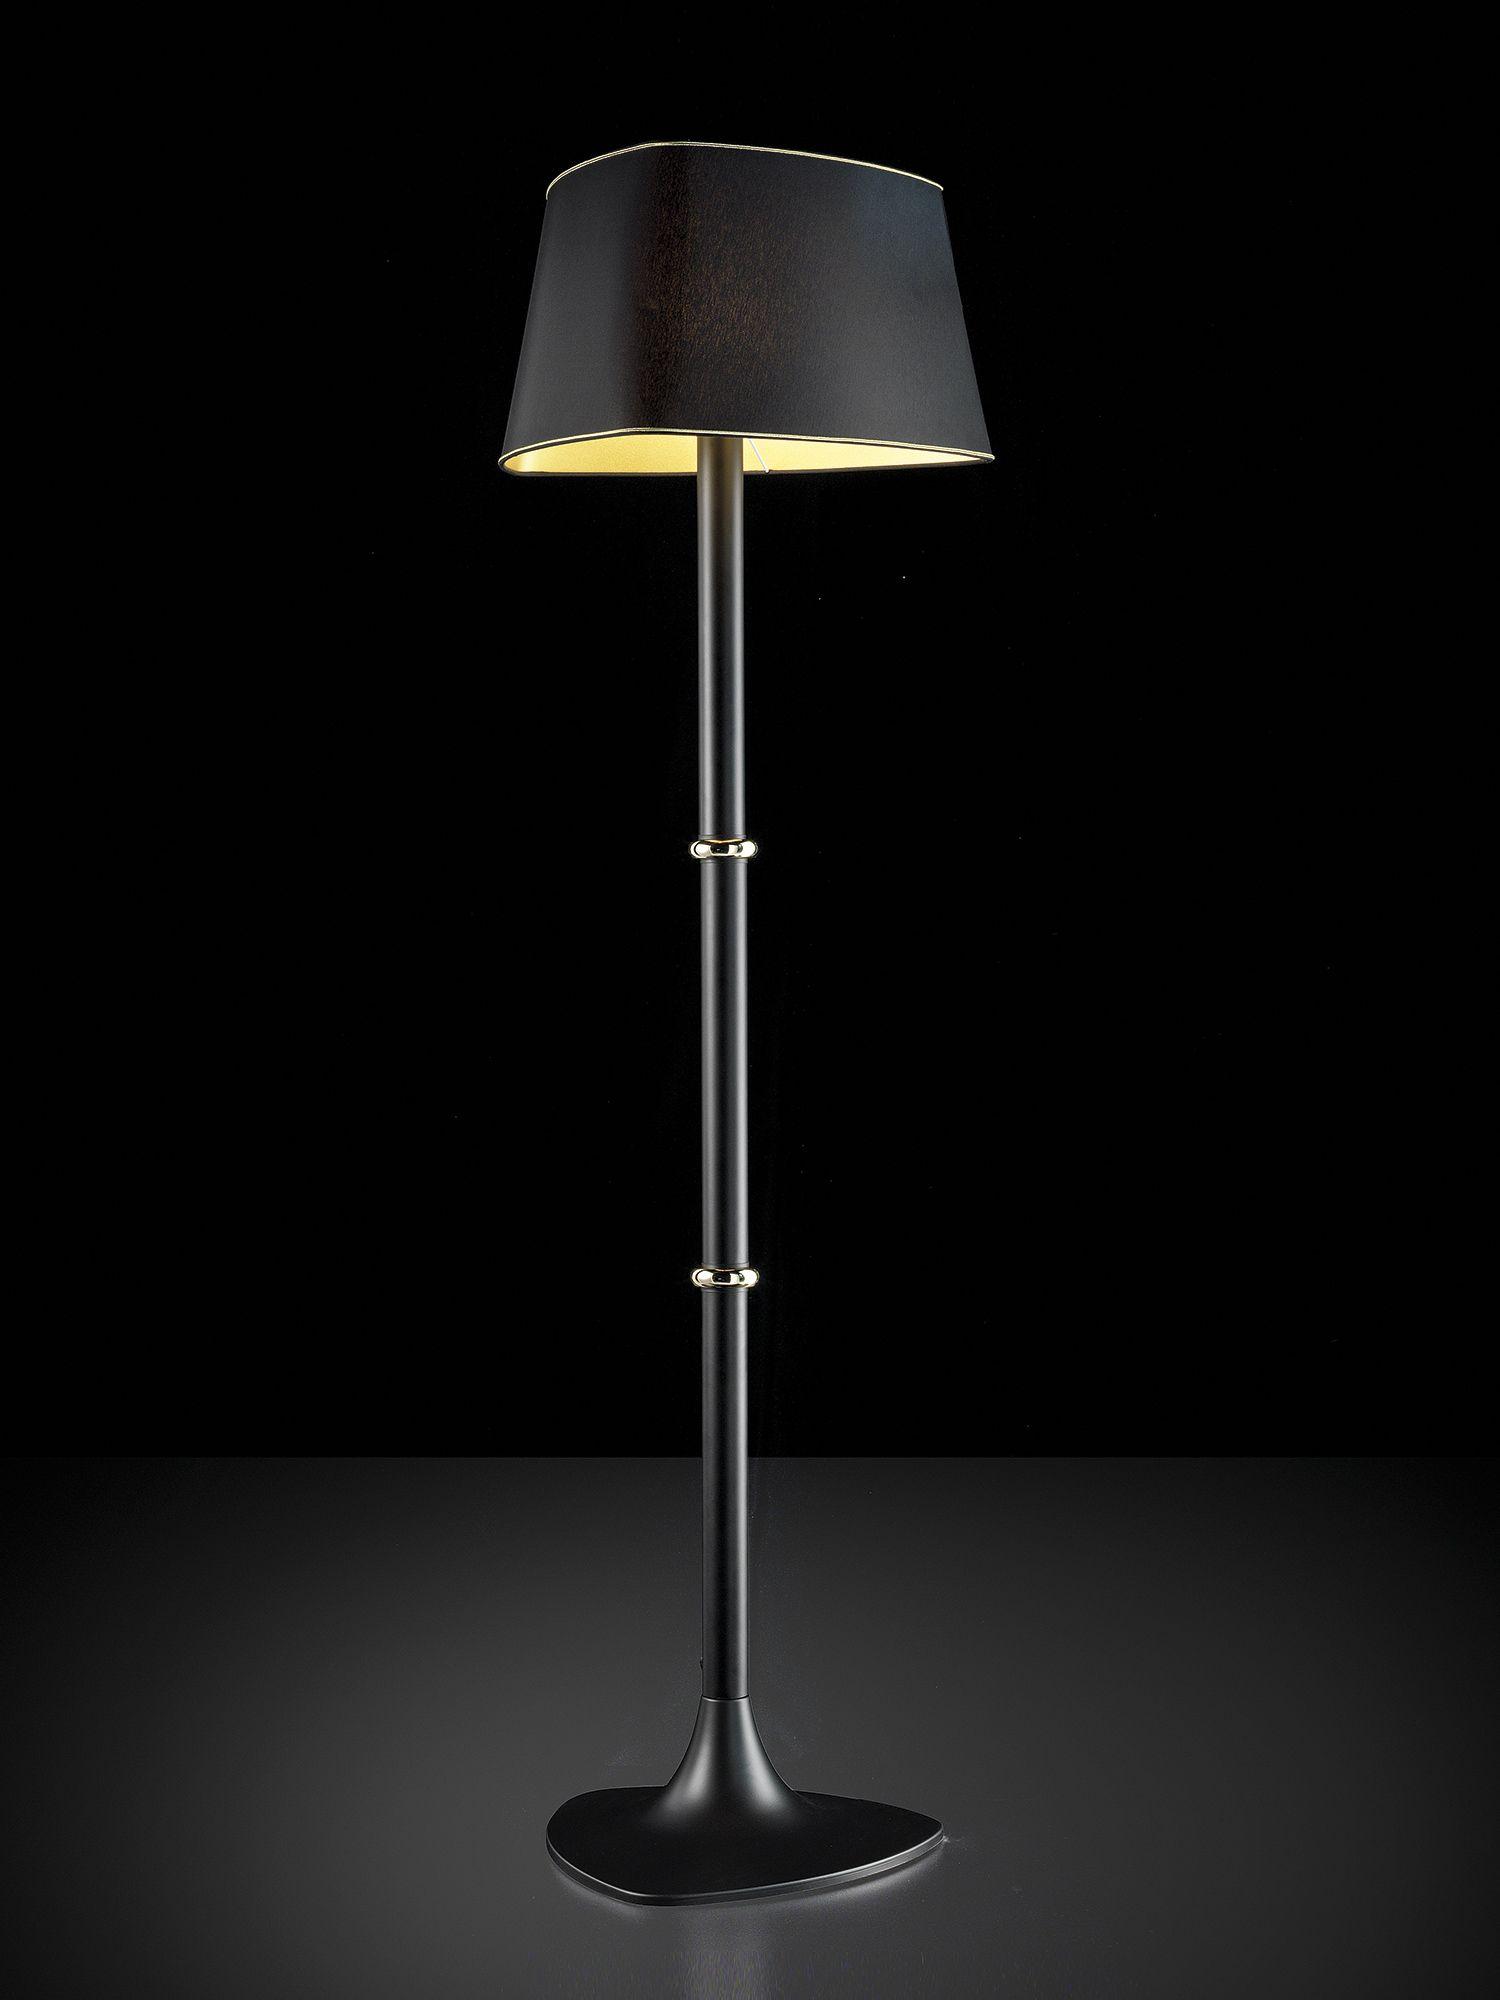 Park Art My WordPress Blog_Black And Gold Floor Lamp Shade